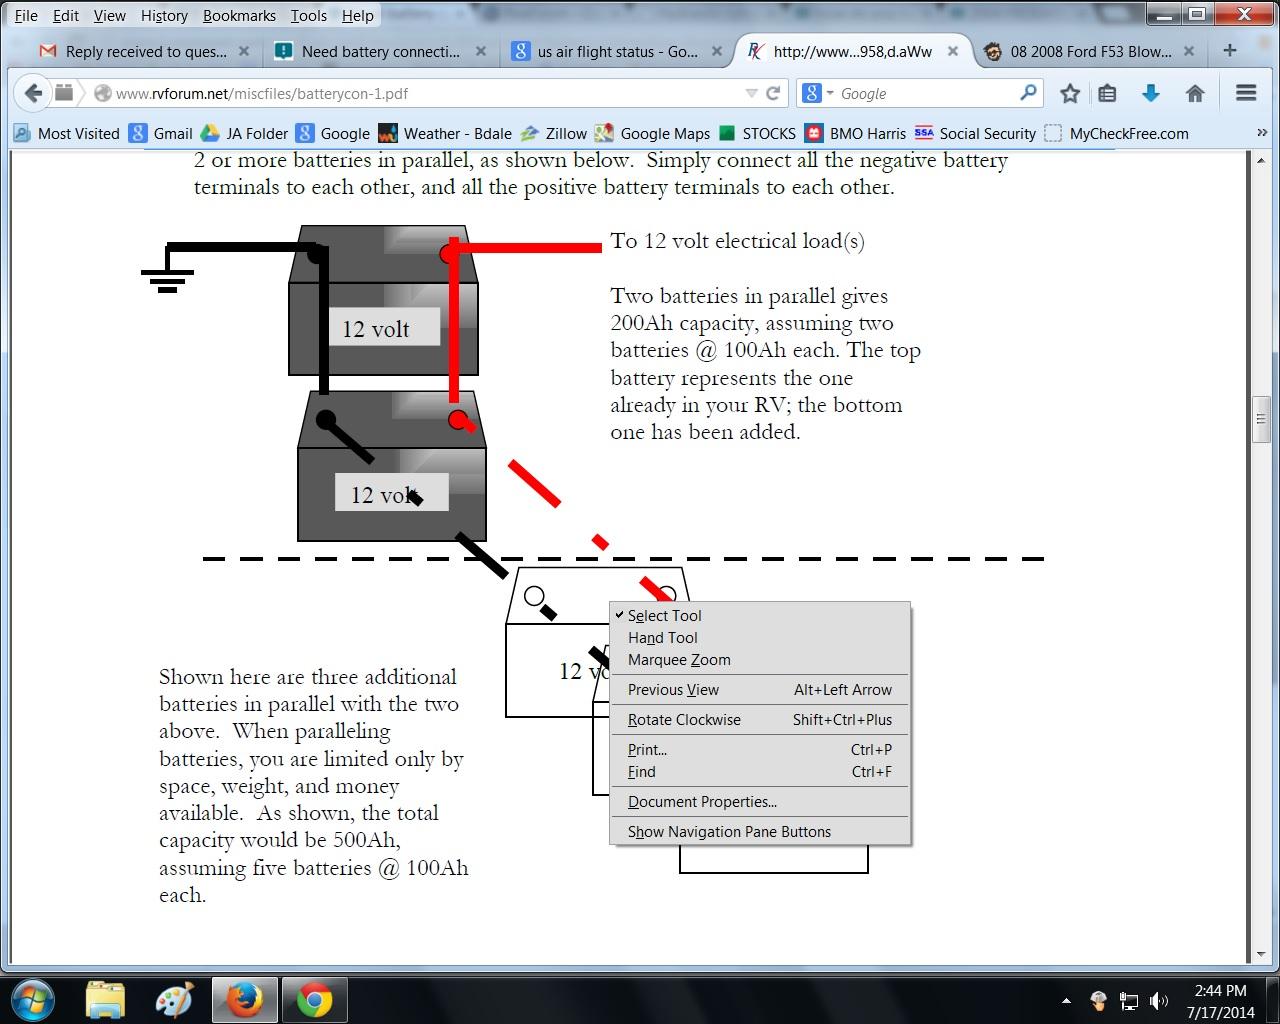 dbf530ba-ce40-4332-bf9a-b2f95204a705_battery Fl.jpg